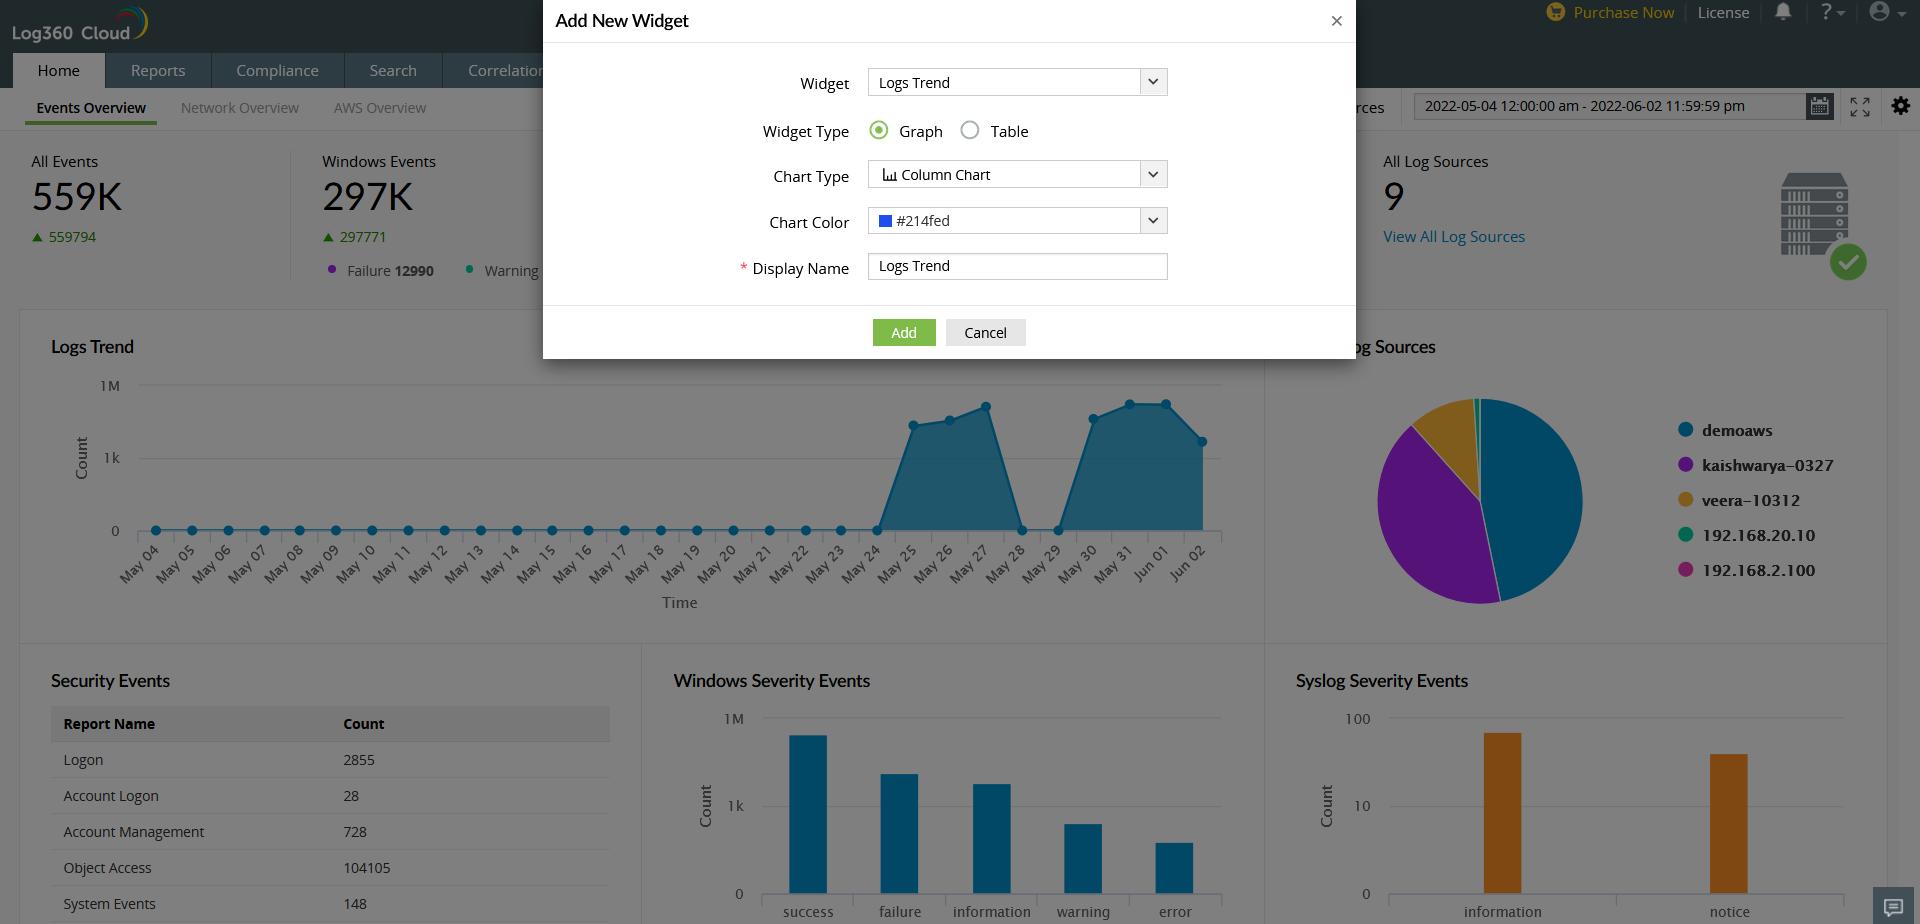 adding-a-new-widget